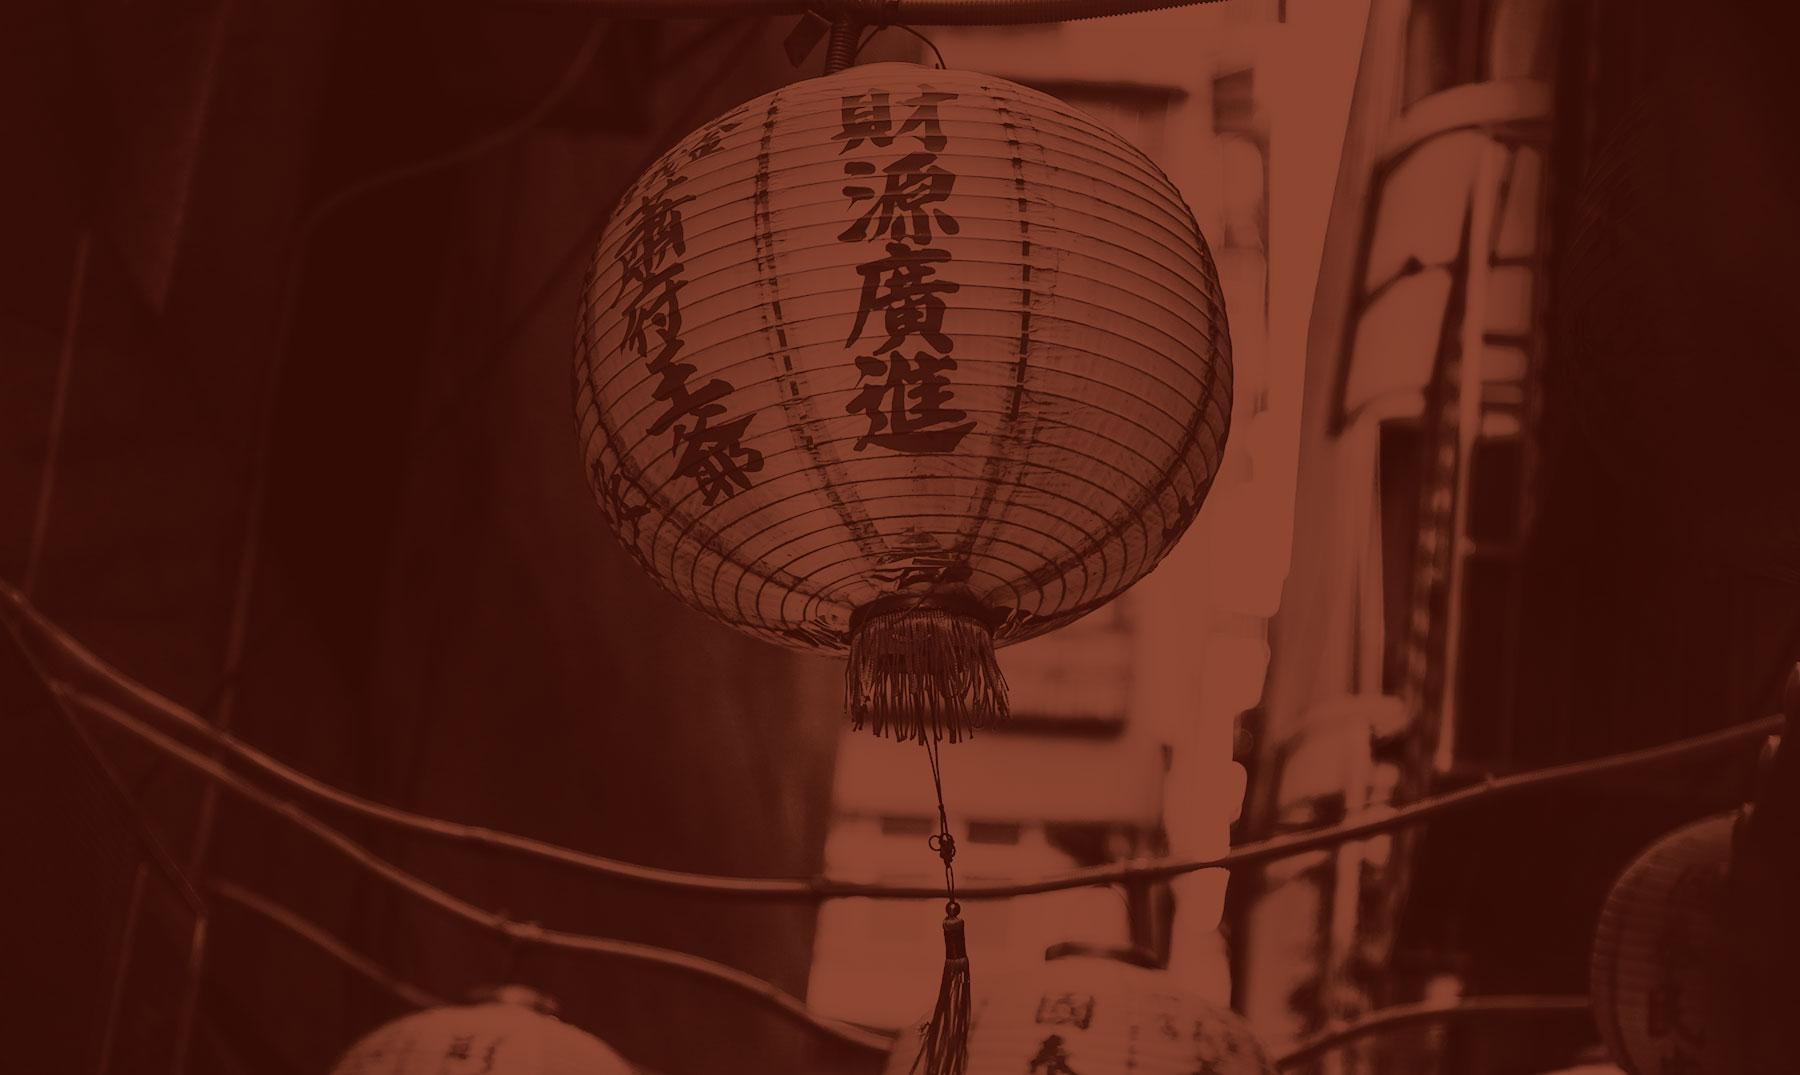 http://www.bethelanguage.com/wp-content/uploads/2018/08/Background-Chinese-Be-The-Language.jpg